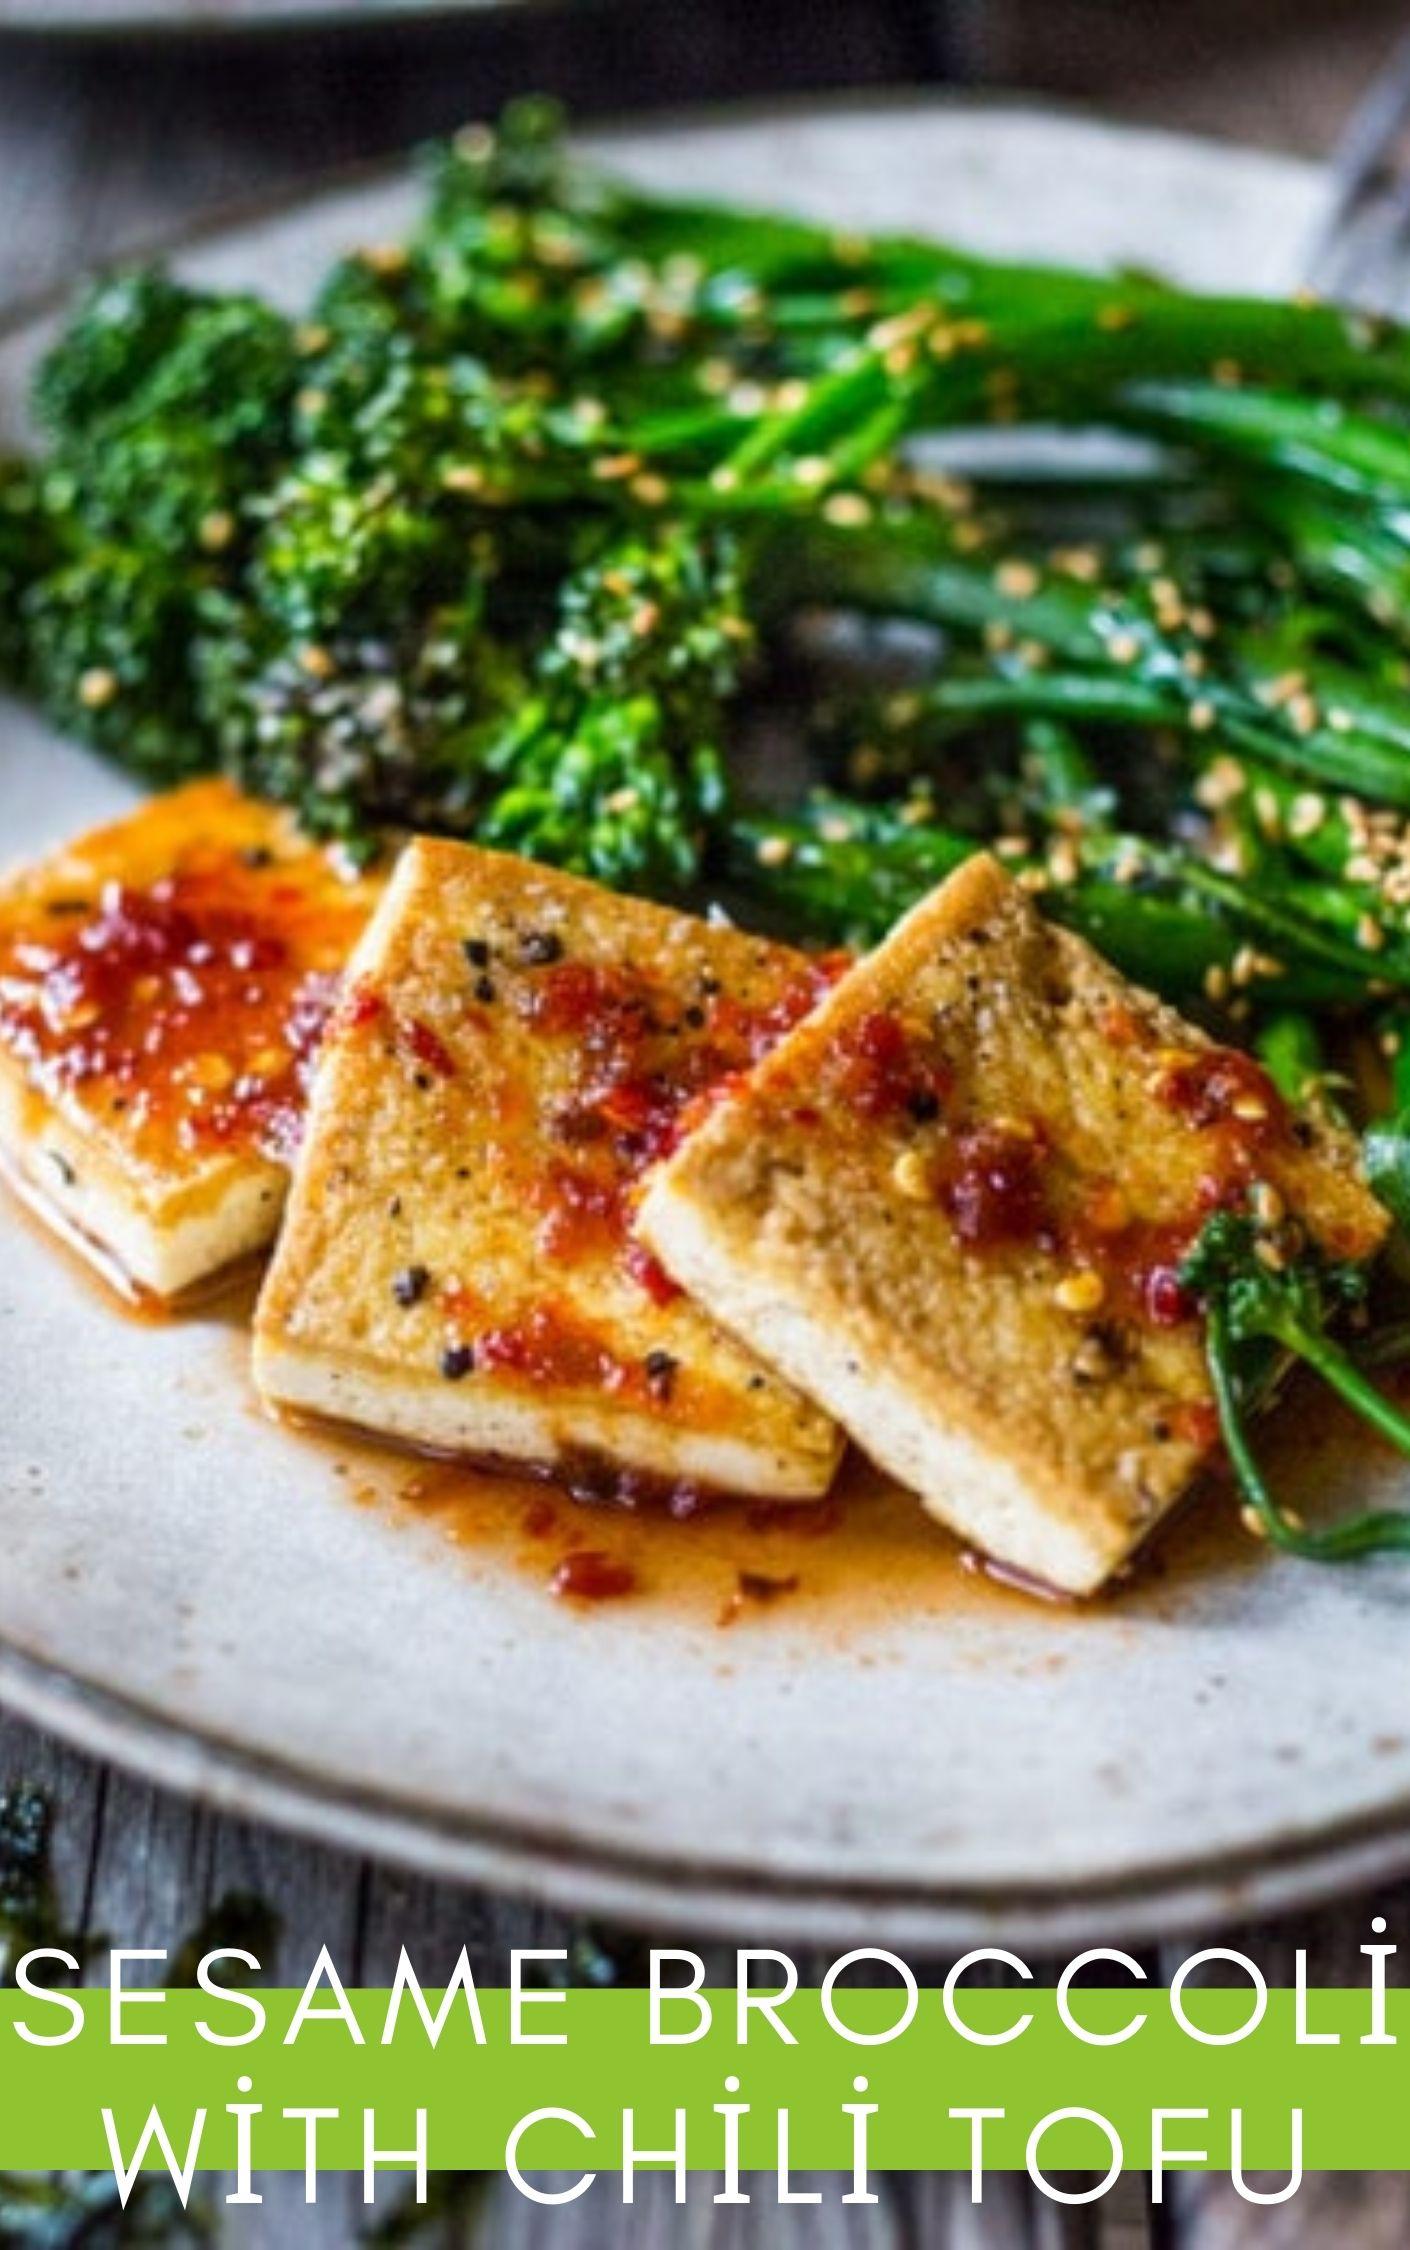 sesame broccoli with chili tofu